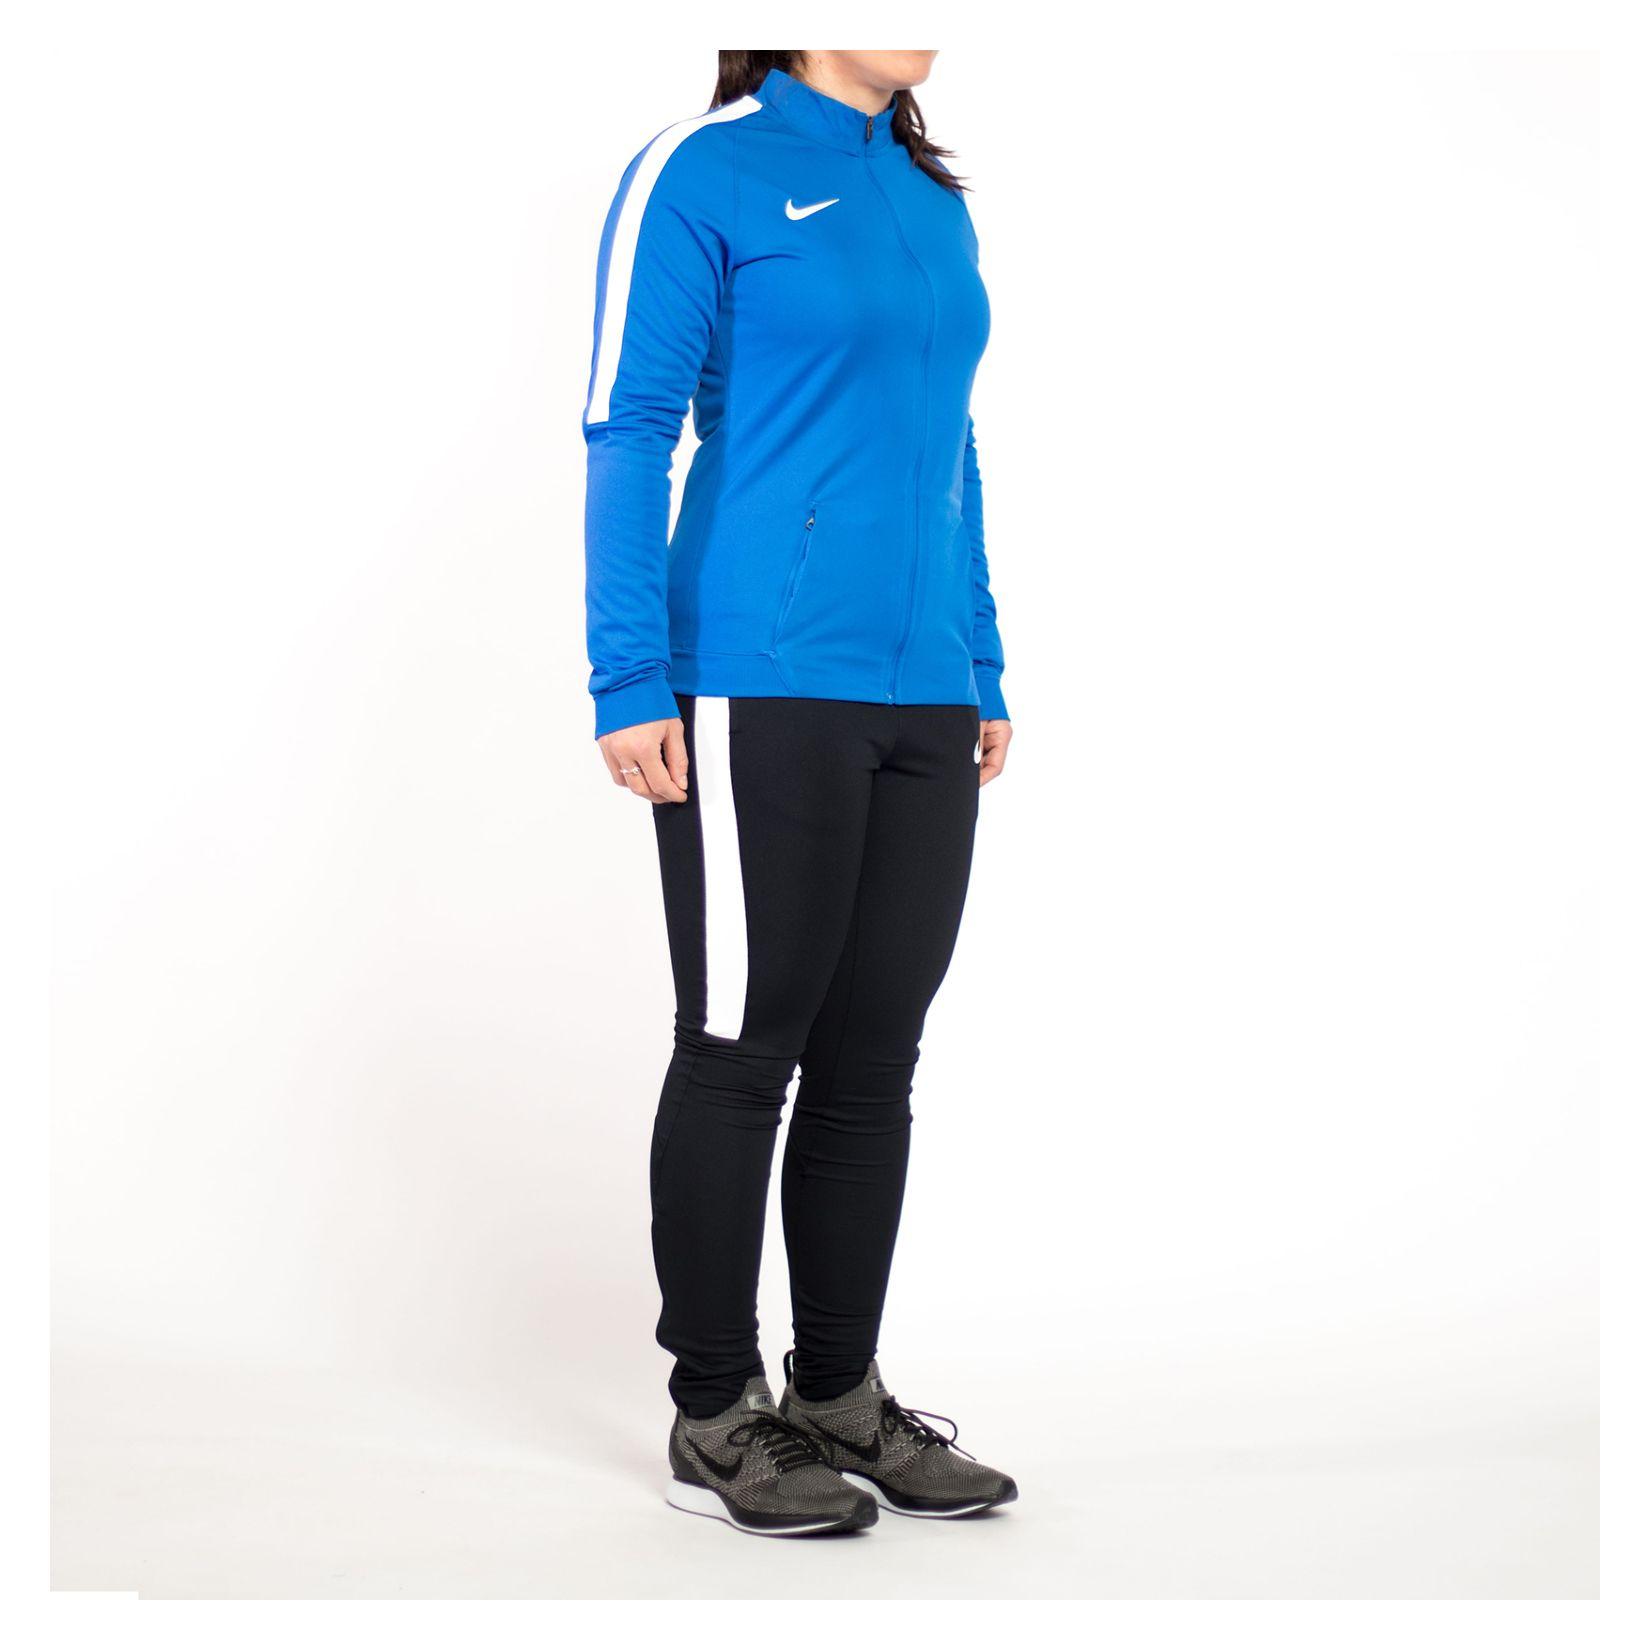 Nike Women's Squad 17 Knit II Tracksuit (S/M/L only) for £36.95 delivered @ Kitlocker